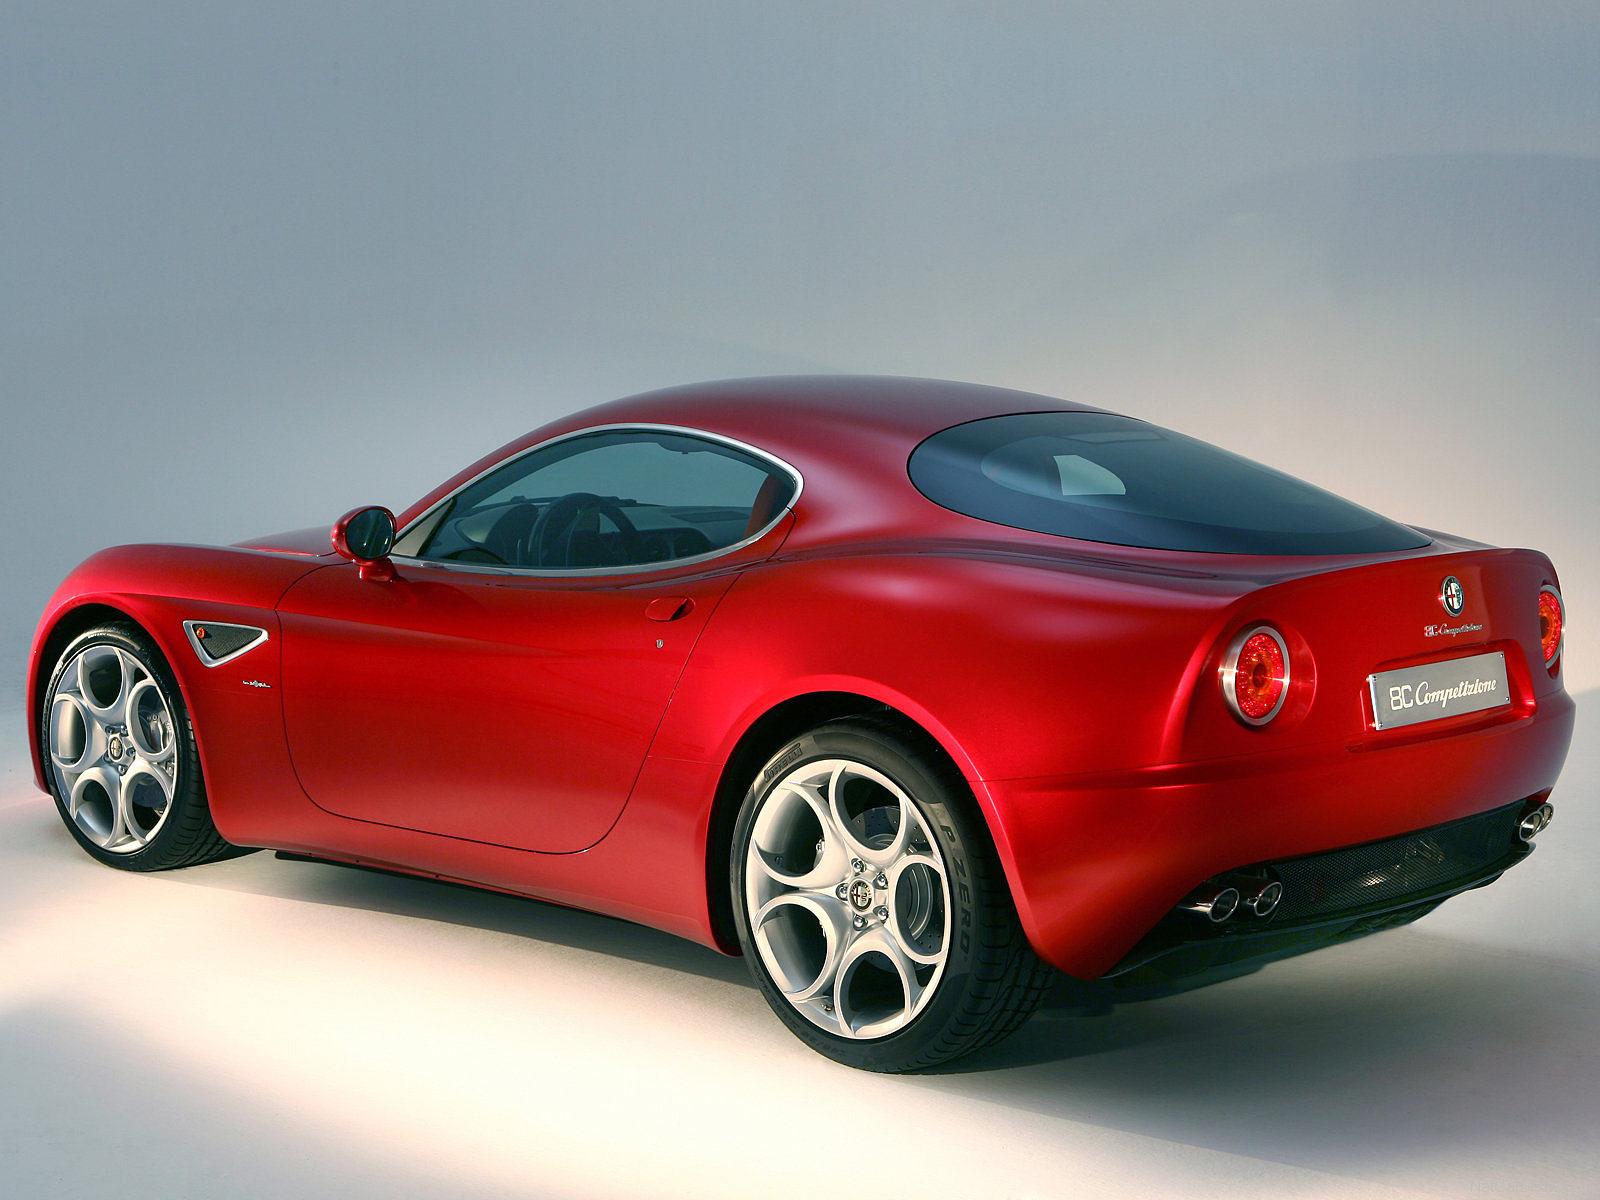 http://4.bp.blogspot.com/-0UHkzgueneA/Tr3SxLcg7RI/AAAAAAAAD14/jGaUIpN_Ll8/s1600/2007_ALFA-ROMEO-8C-Competizione_car-desktop-wallpaper_05.jpg